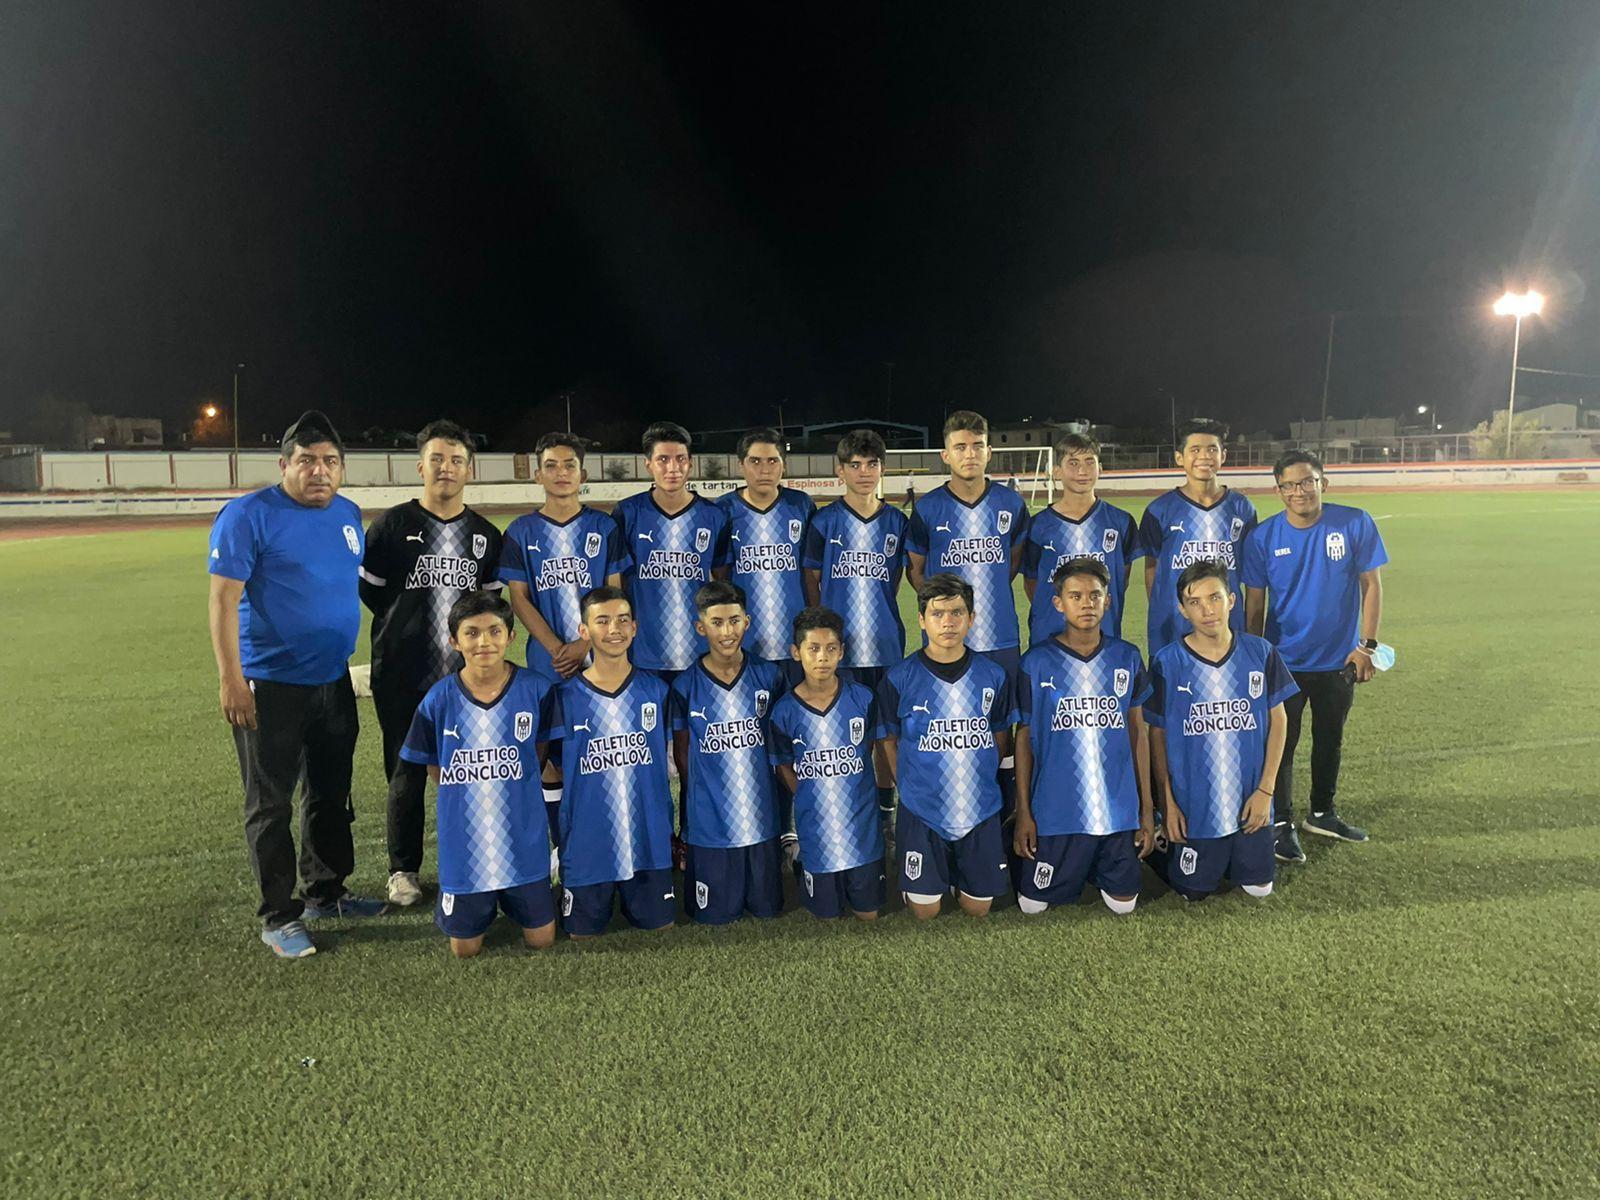 Destacan equipos del Club Atlético Monclova